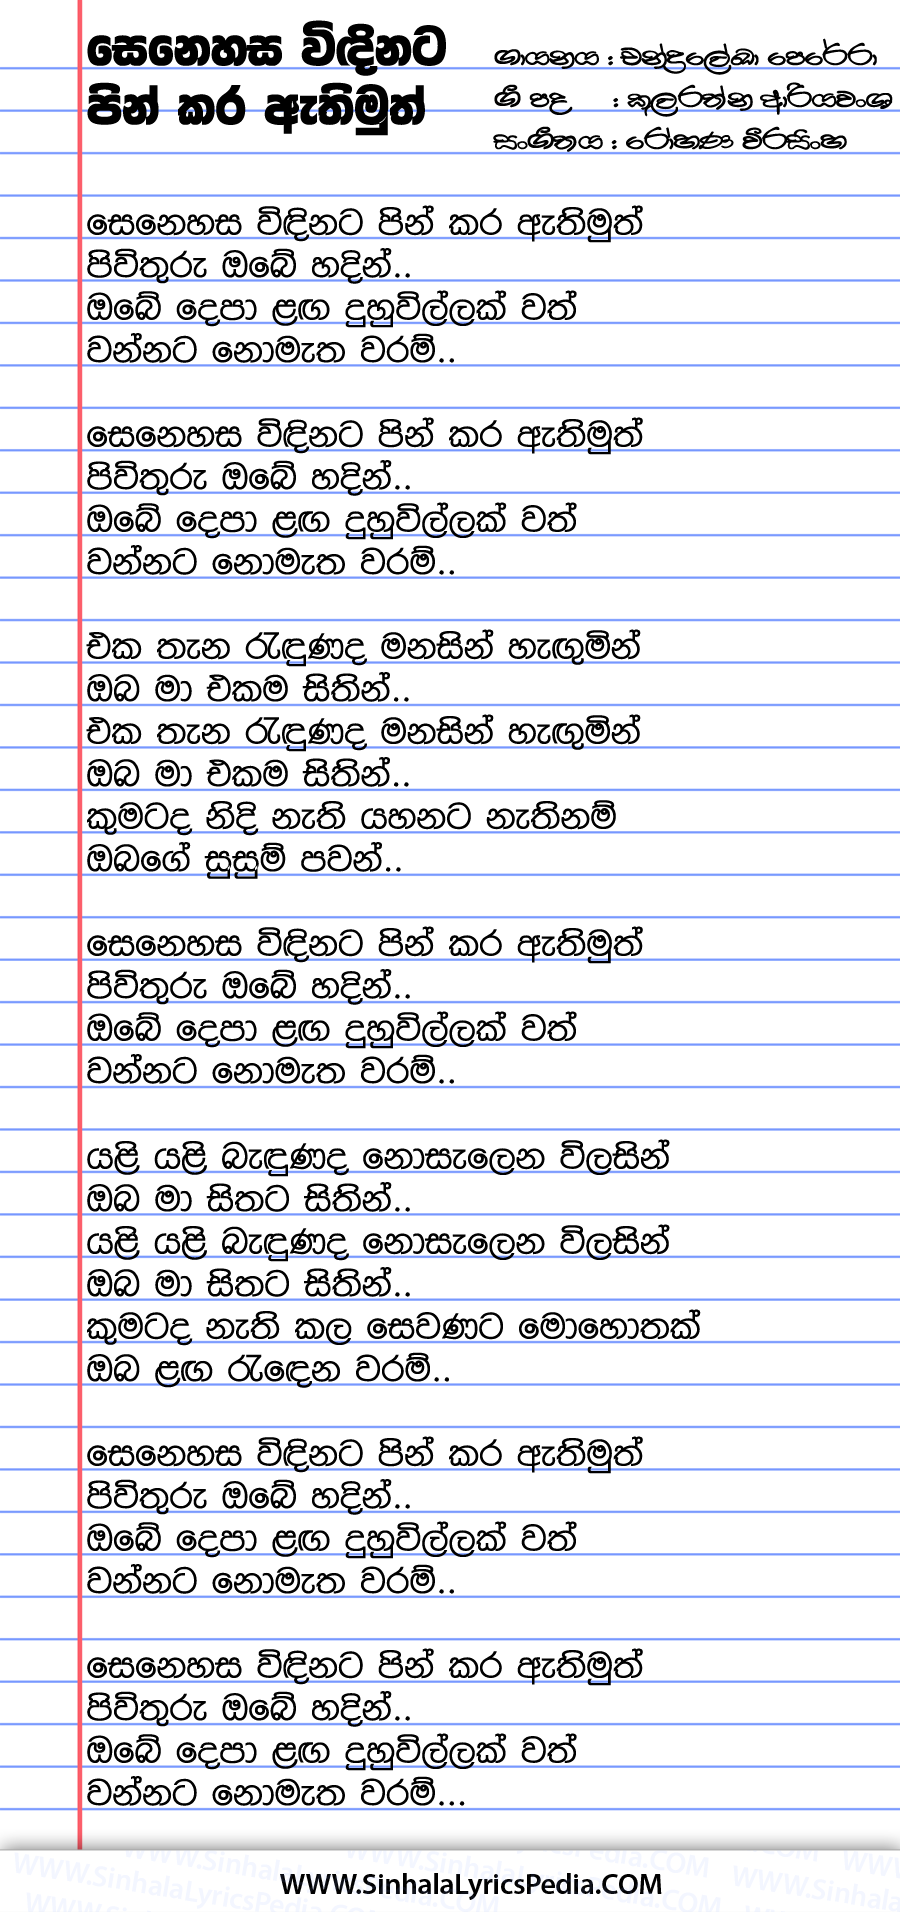 Senehasa Widinata Pin Kara Nathi Muth Song Lyrics